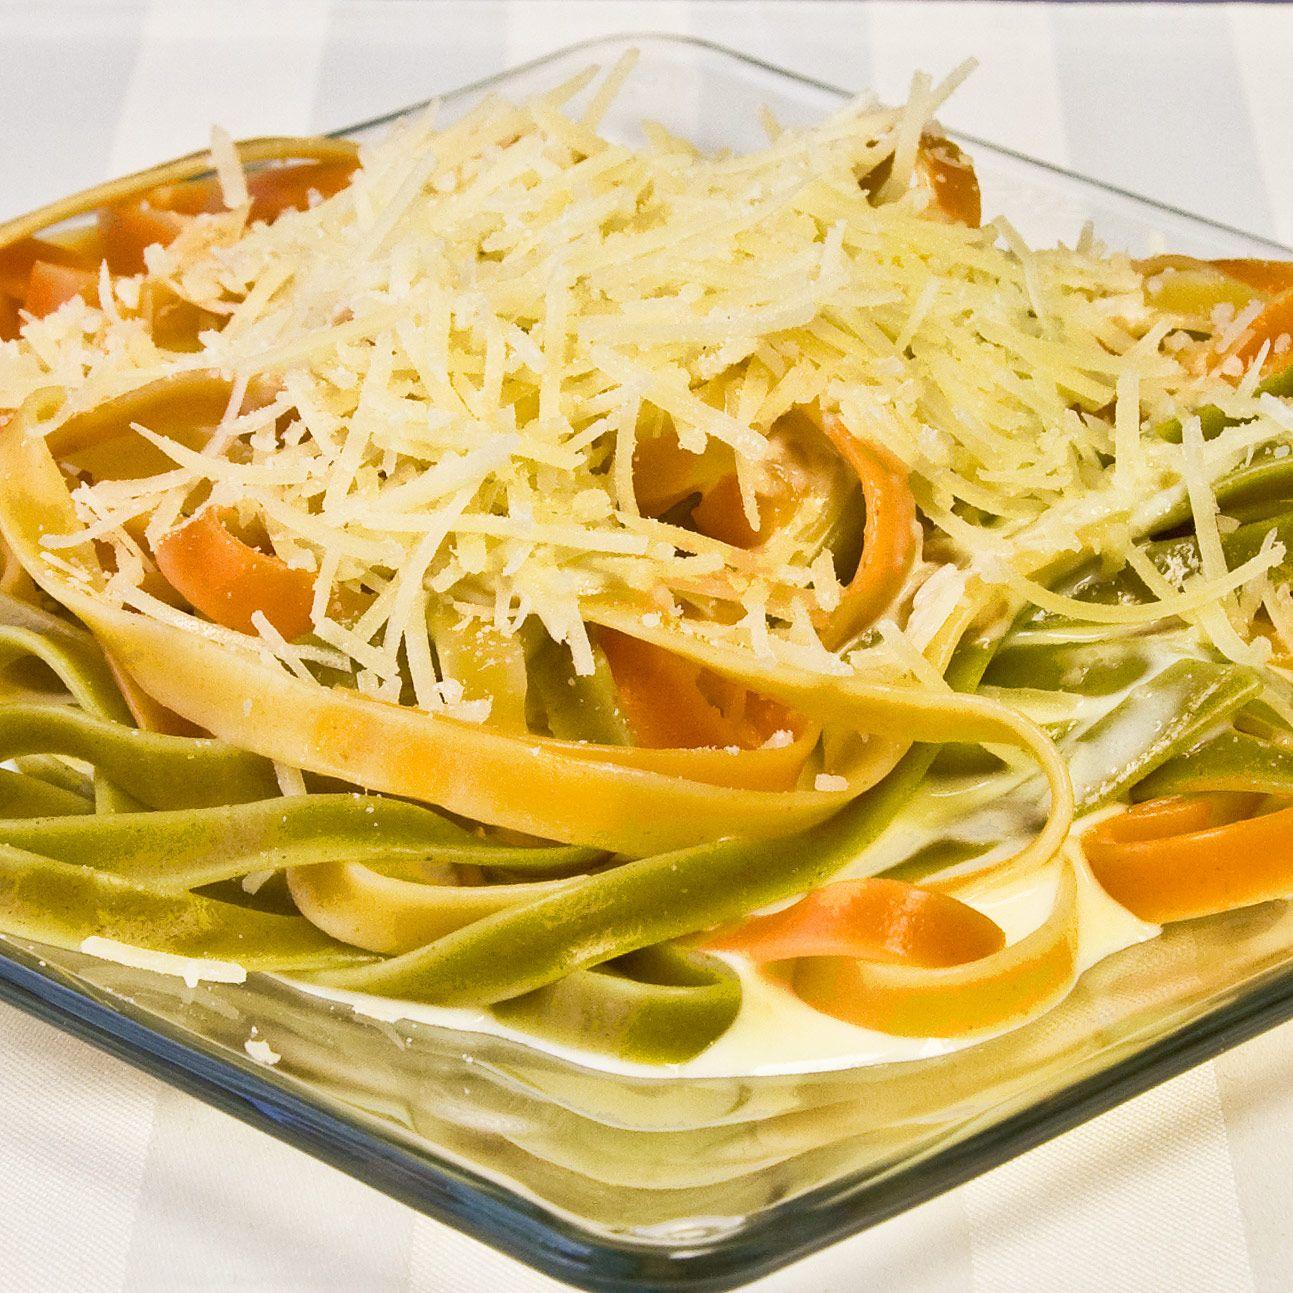 Olive Garden Alfredo Sauce Olive garden alfredo sauce